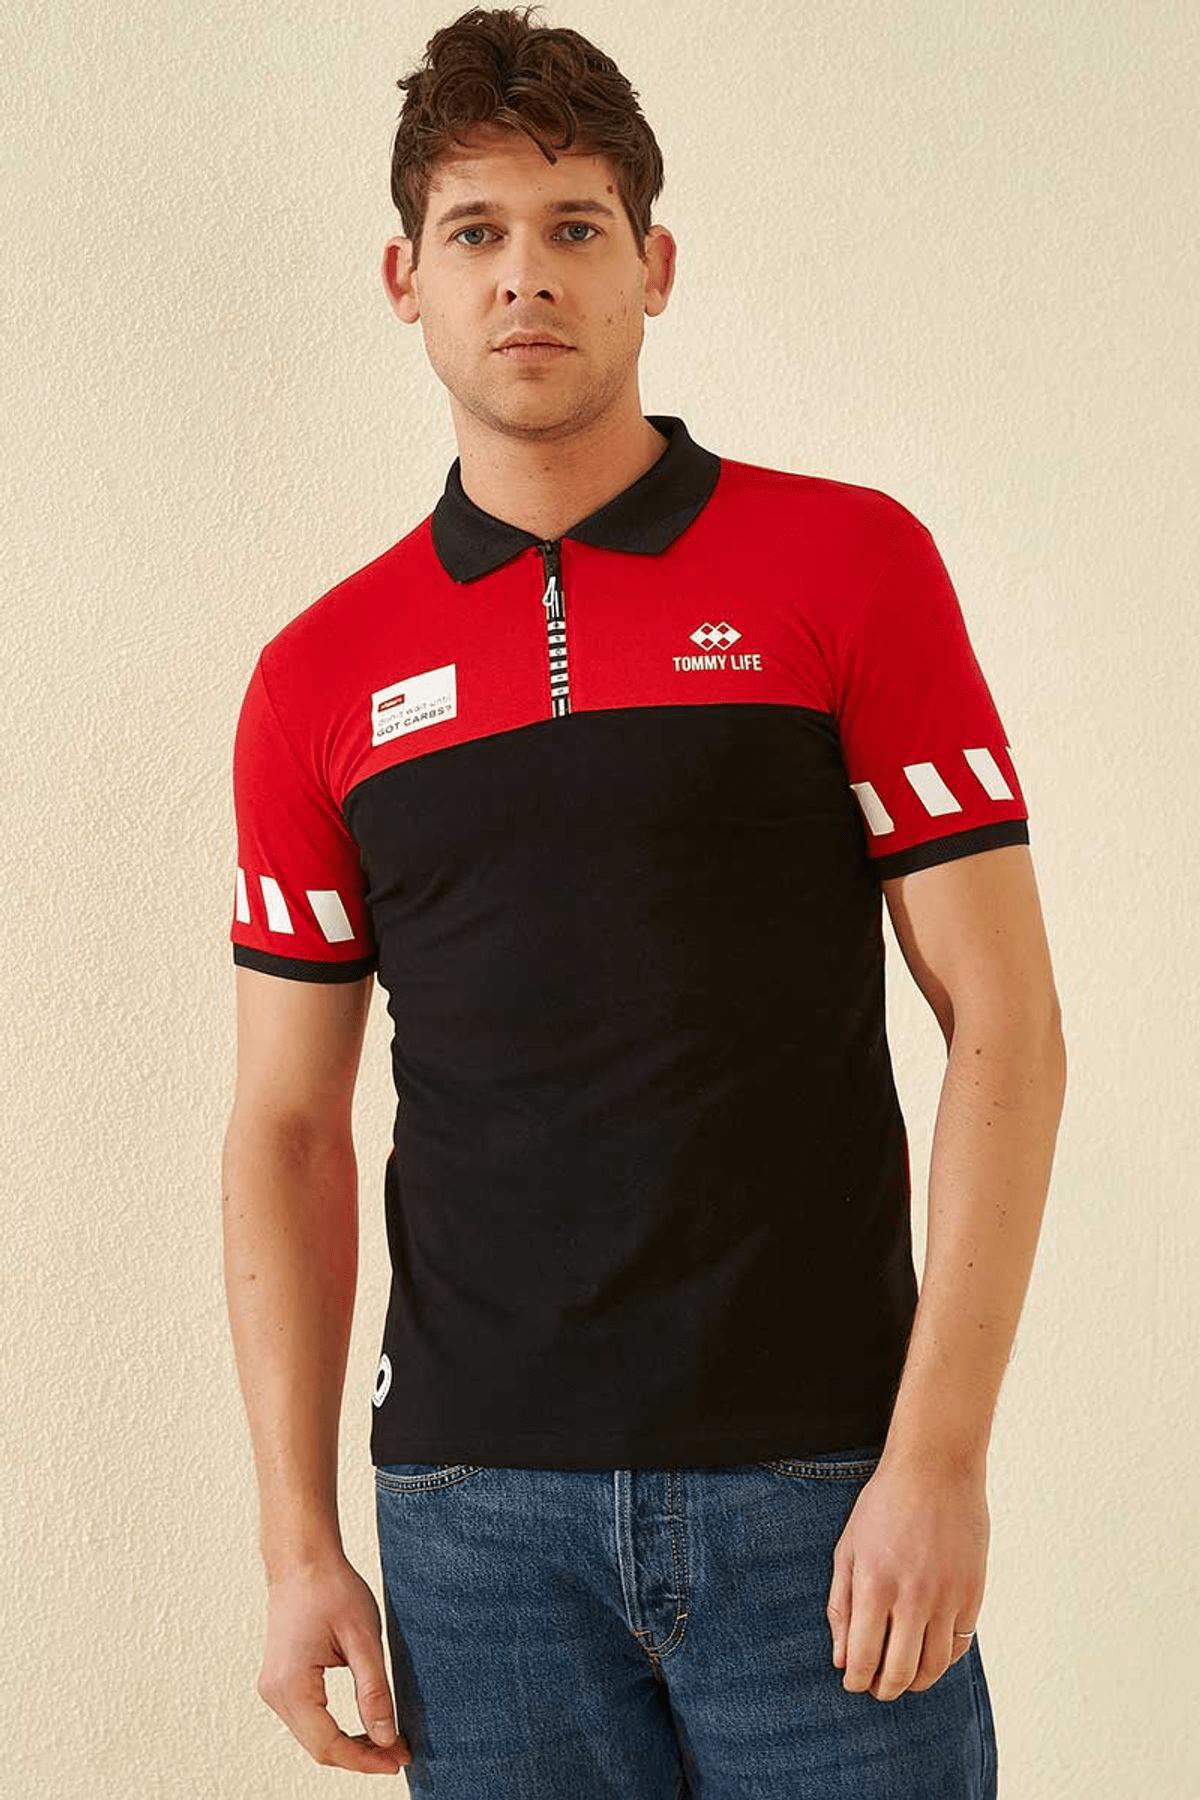 Tommy Life Kol Detaylı Polo Yaka Kırmızı Erkek T-Shirt T08ER-87800_1 2